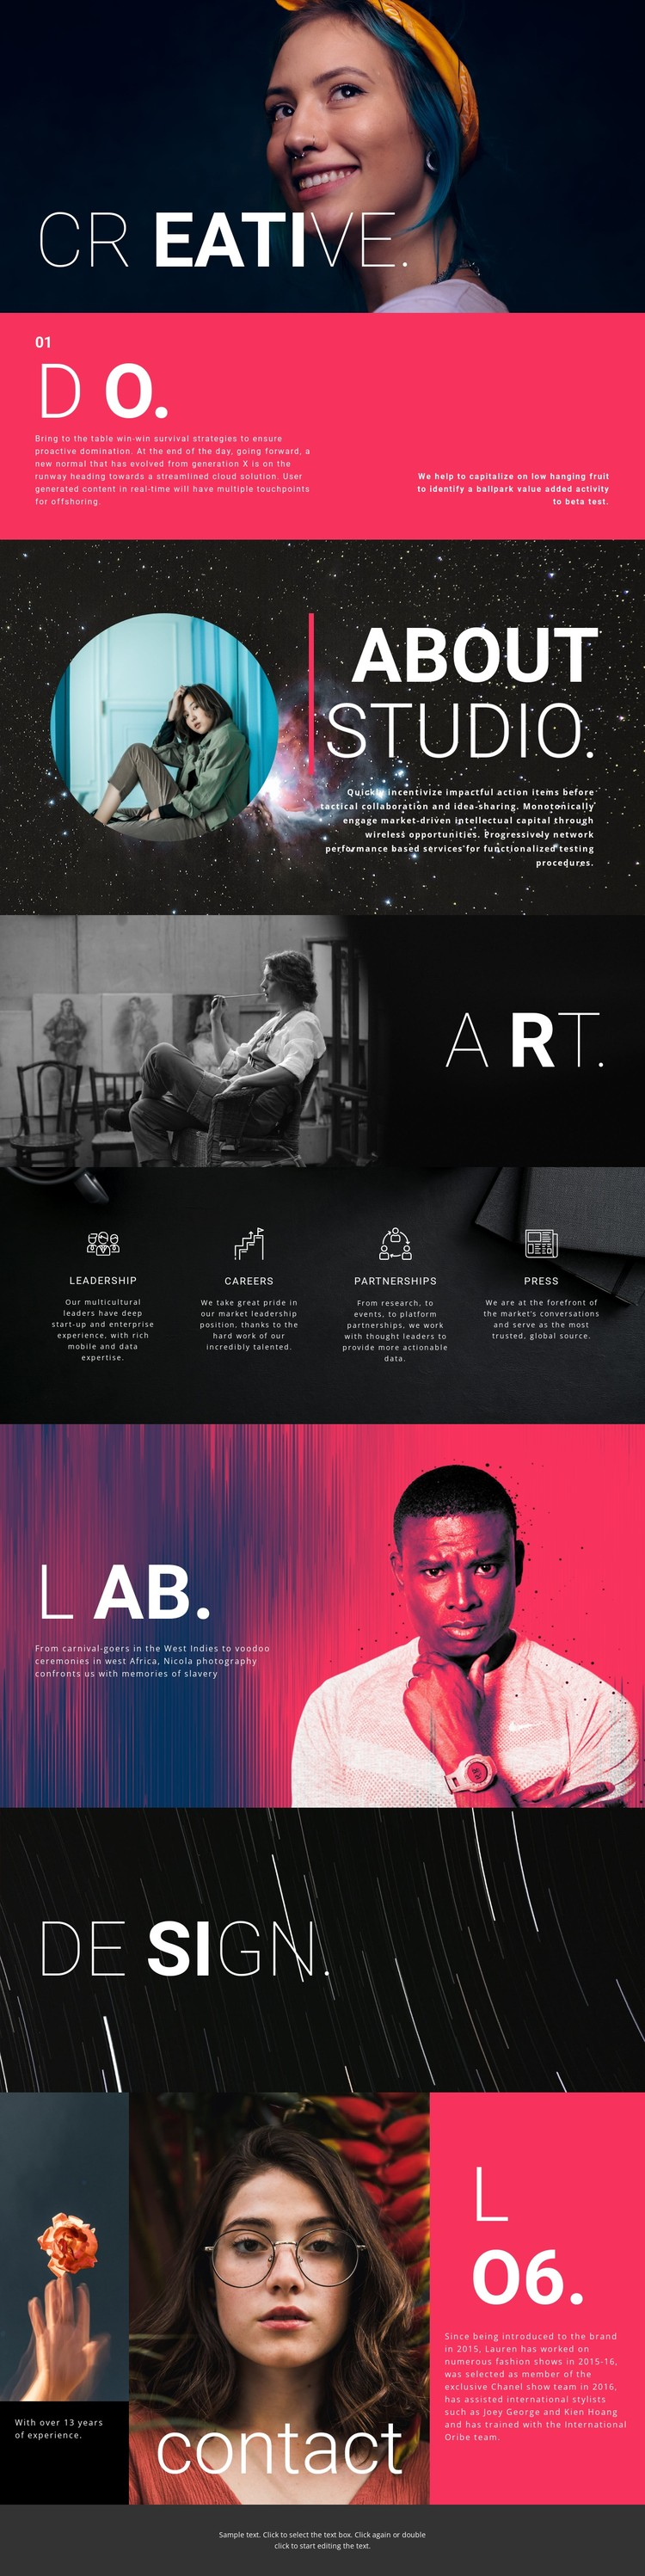 Creative design studio CSS Template